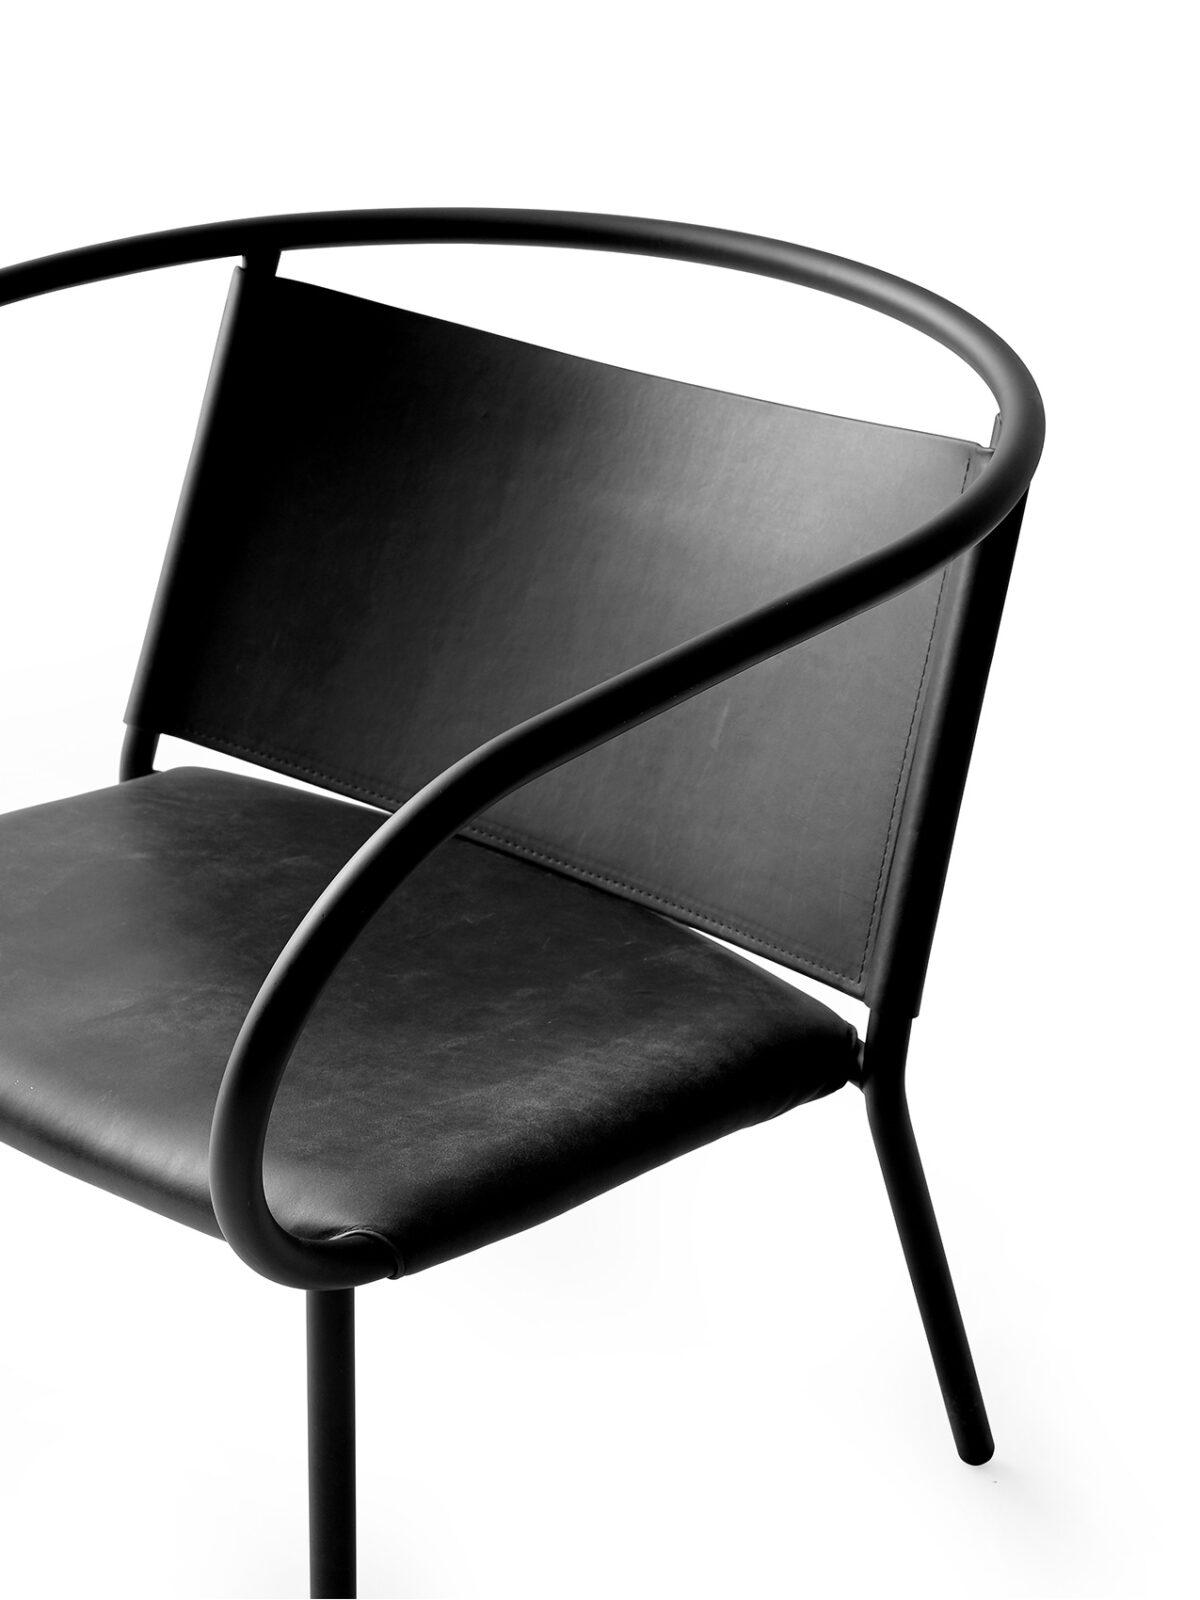 8860539 Afteroom Lounge Chair Dunes Black detail 2